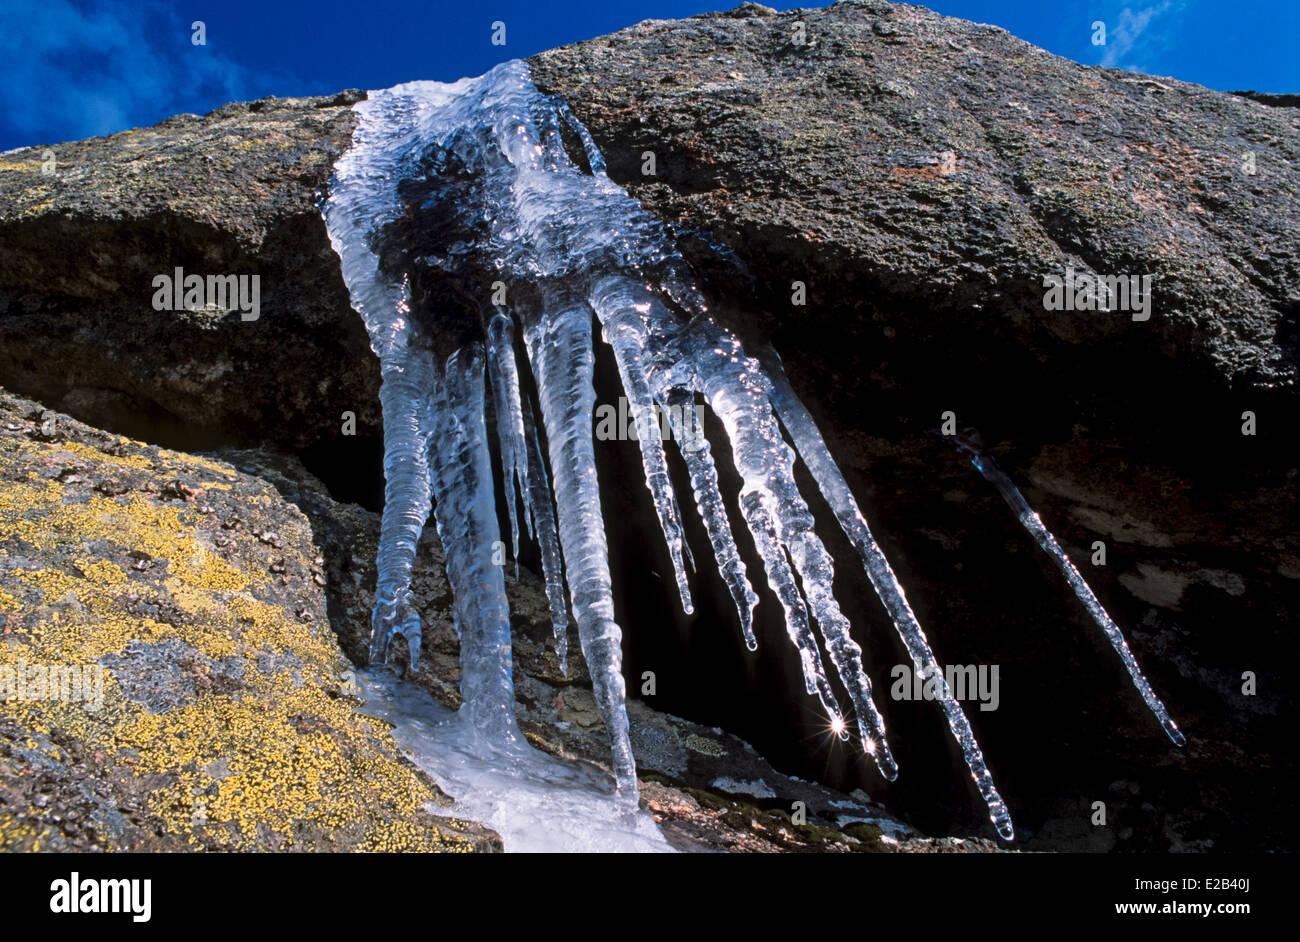 France, Haute Savoie, Mont Blanc Massif, Chamonix, ice stalactites - Stock Image